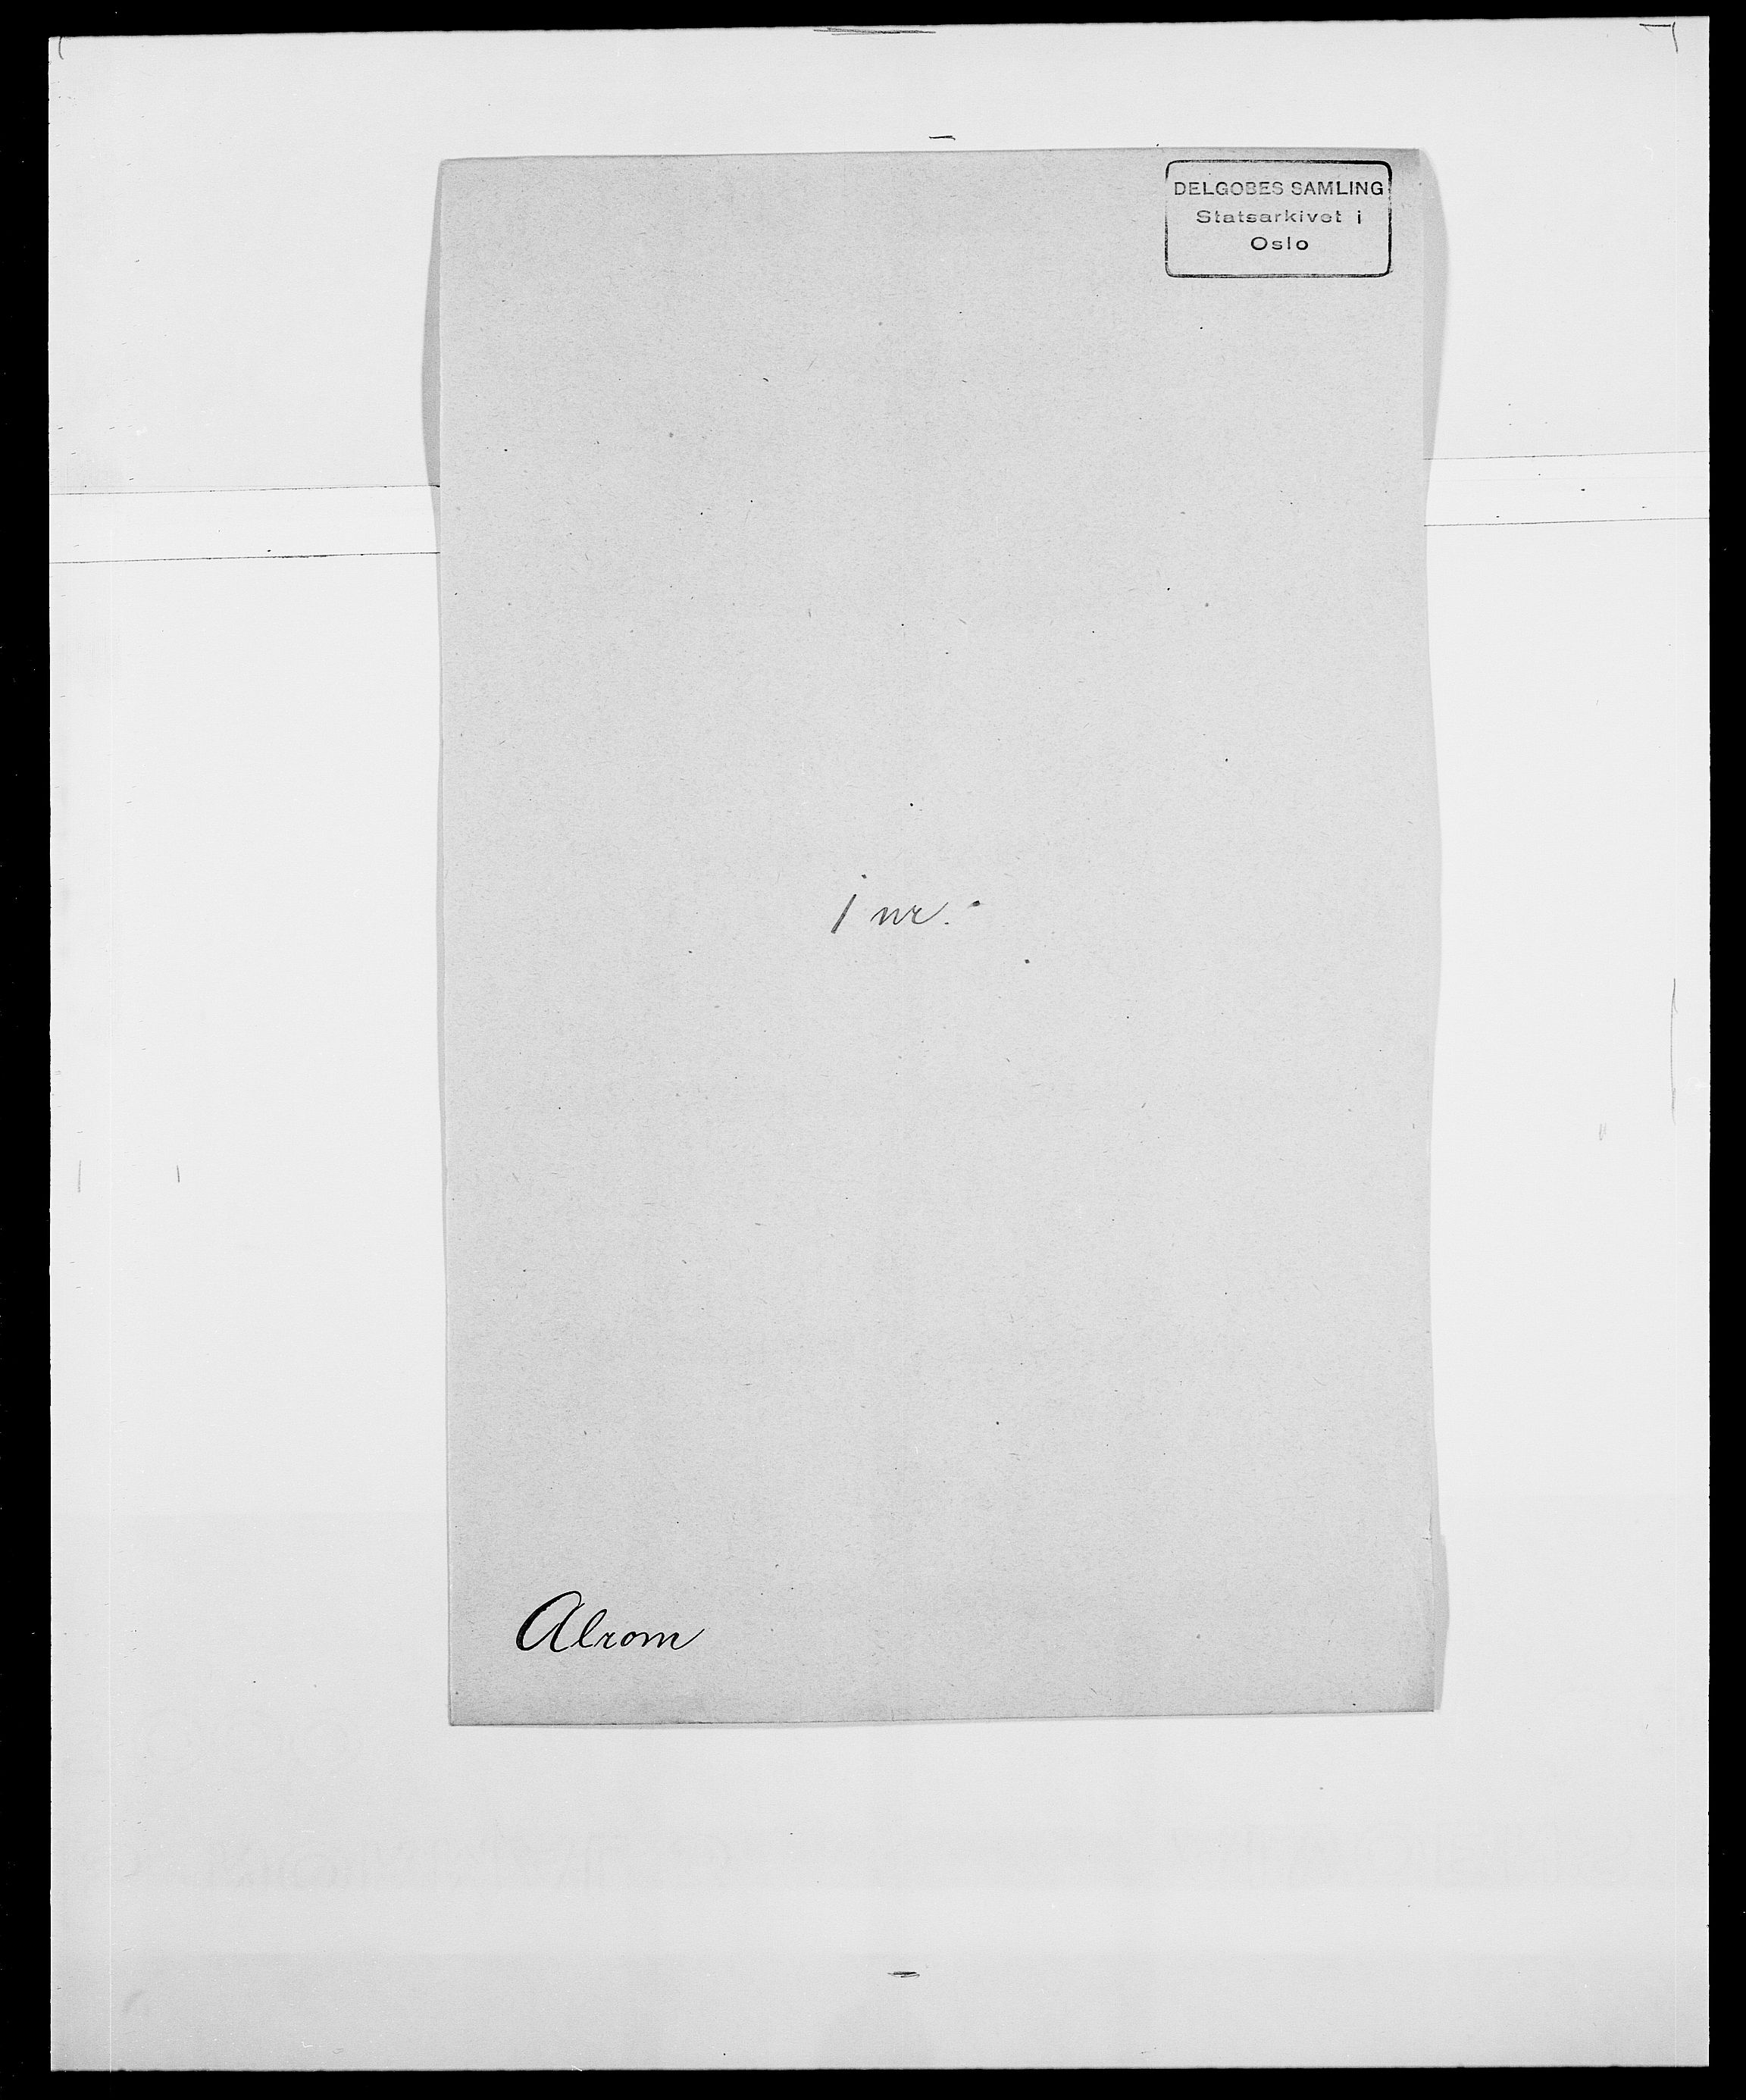 SAO, Delgobe, Charles Antoine - samling, D/Da/L0001: Aabye - Angerman, s. 450